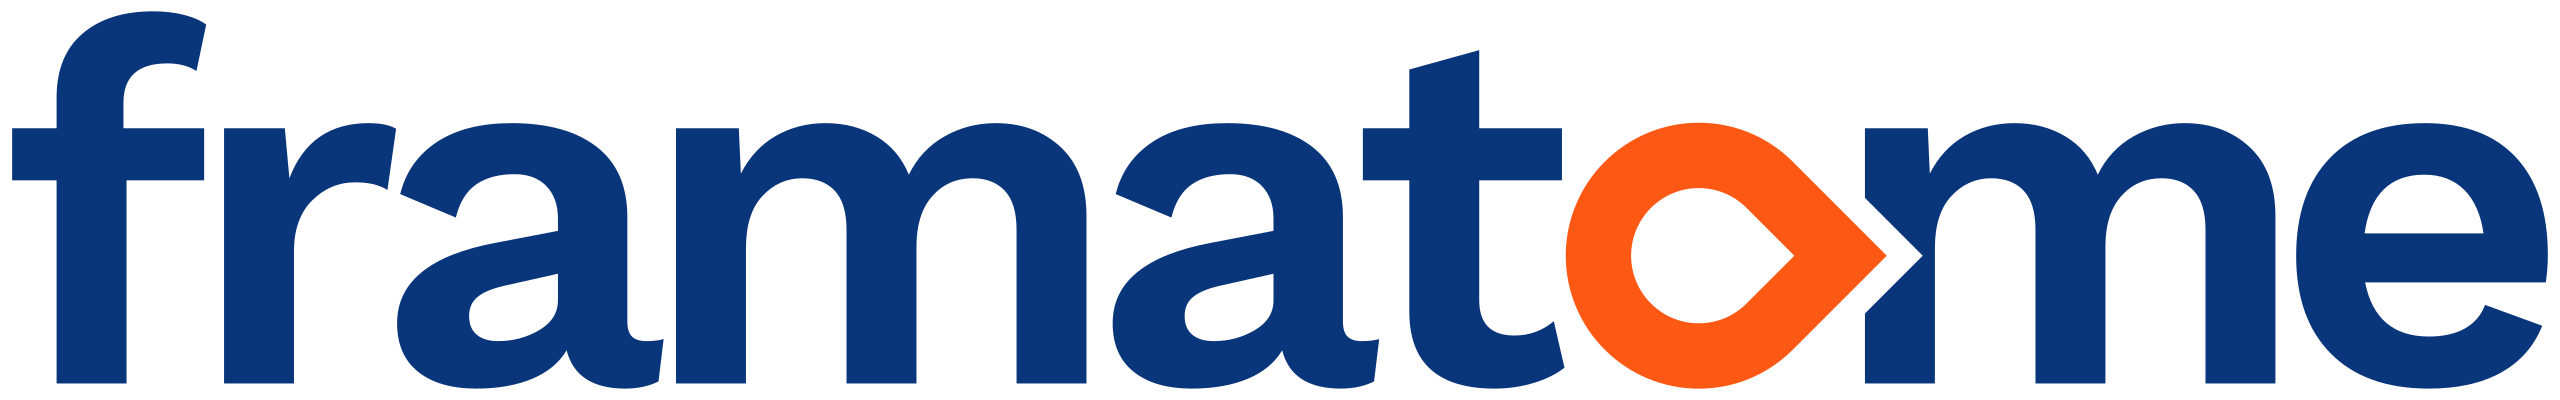 2560px_Framatome_logo.png